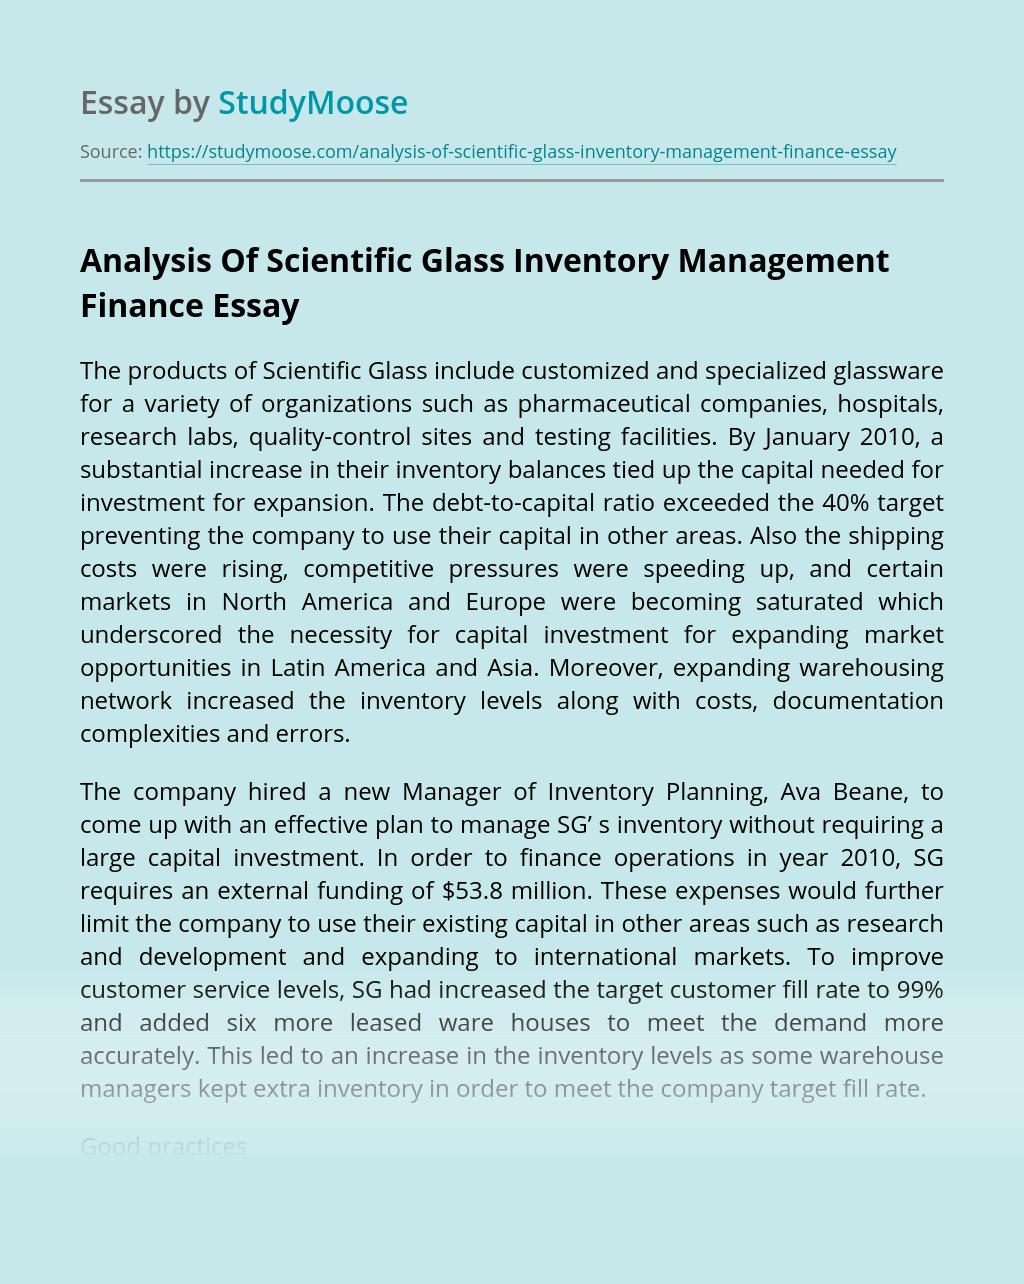 Analysis Of Scientific Glass Inventory Management Finance